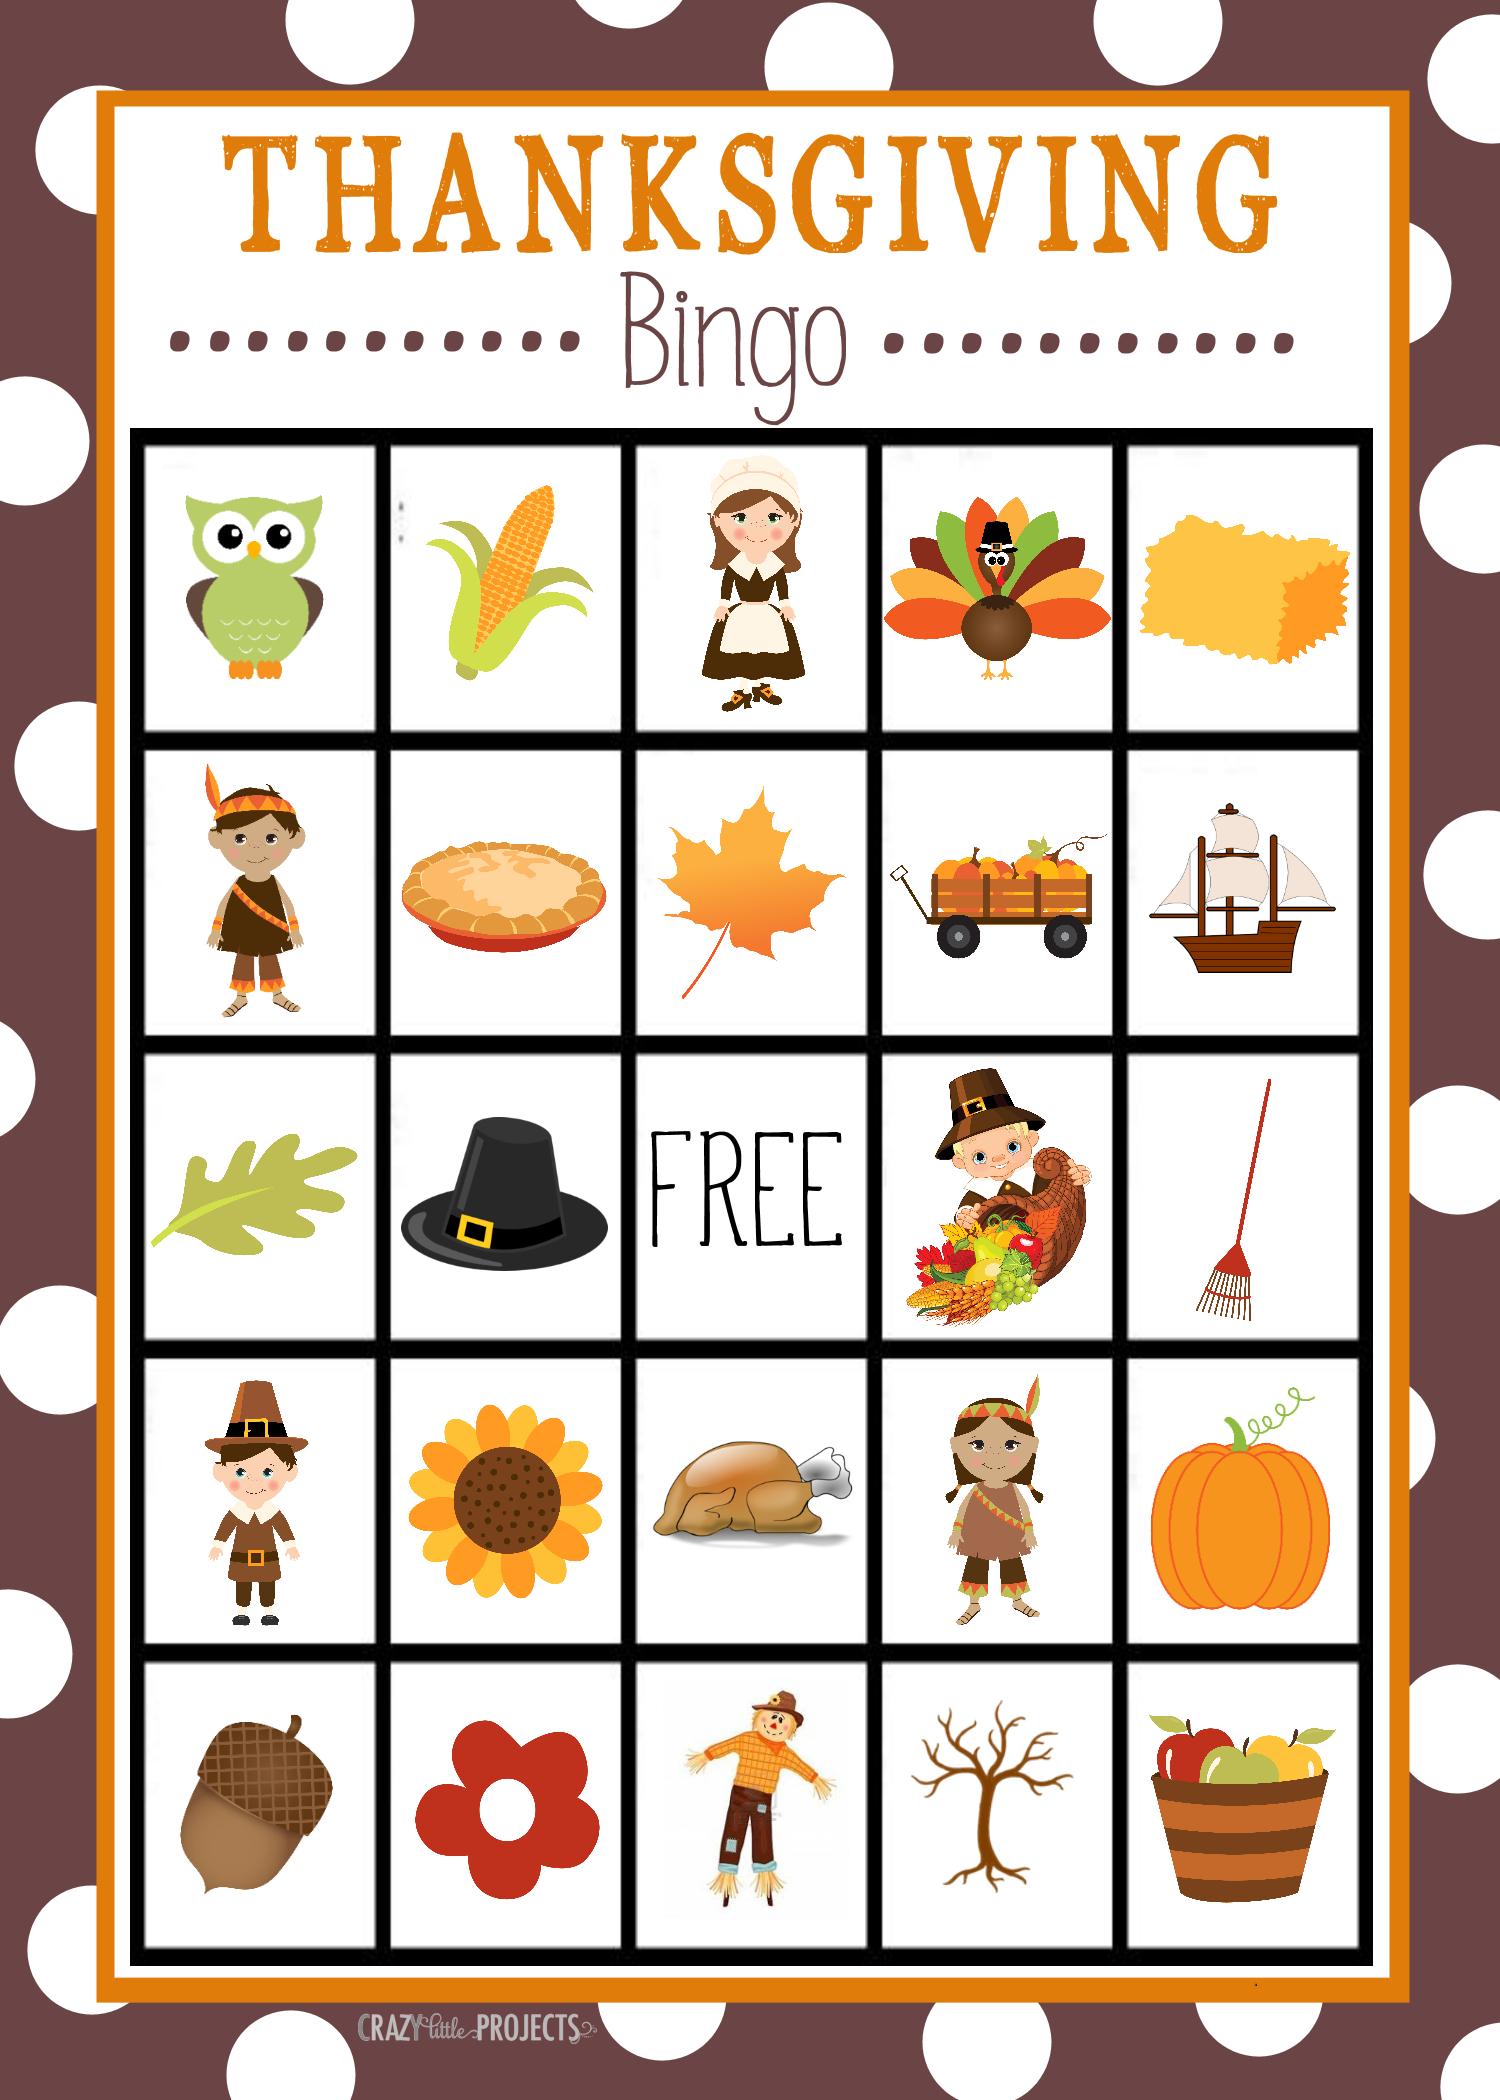 Free Printable Thanksgiving Bingo Game | Craft Time | Thanksgiving - Free Printable Thanksgiving Games For Adults